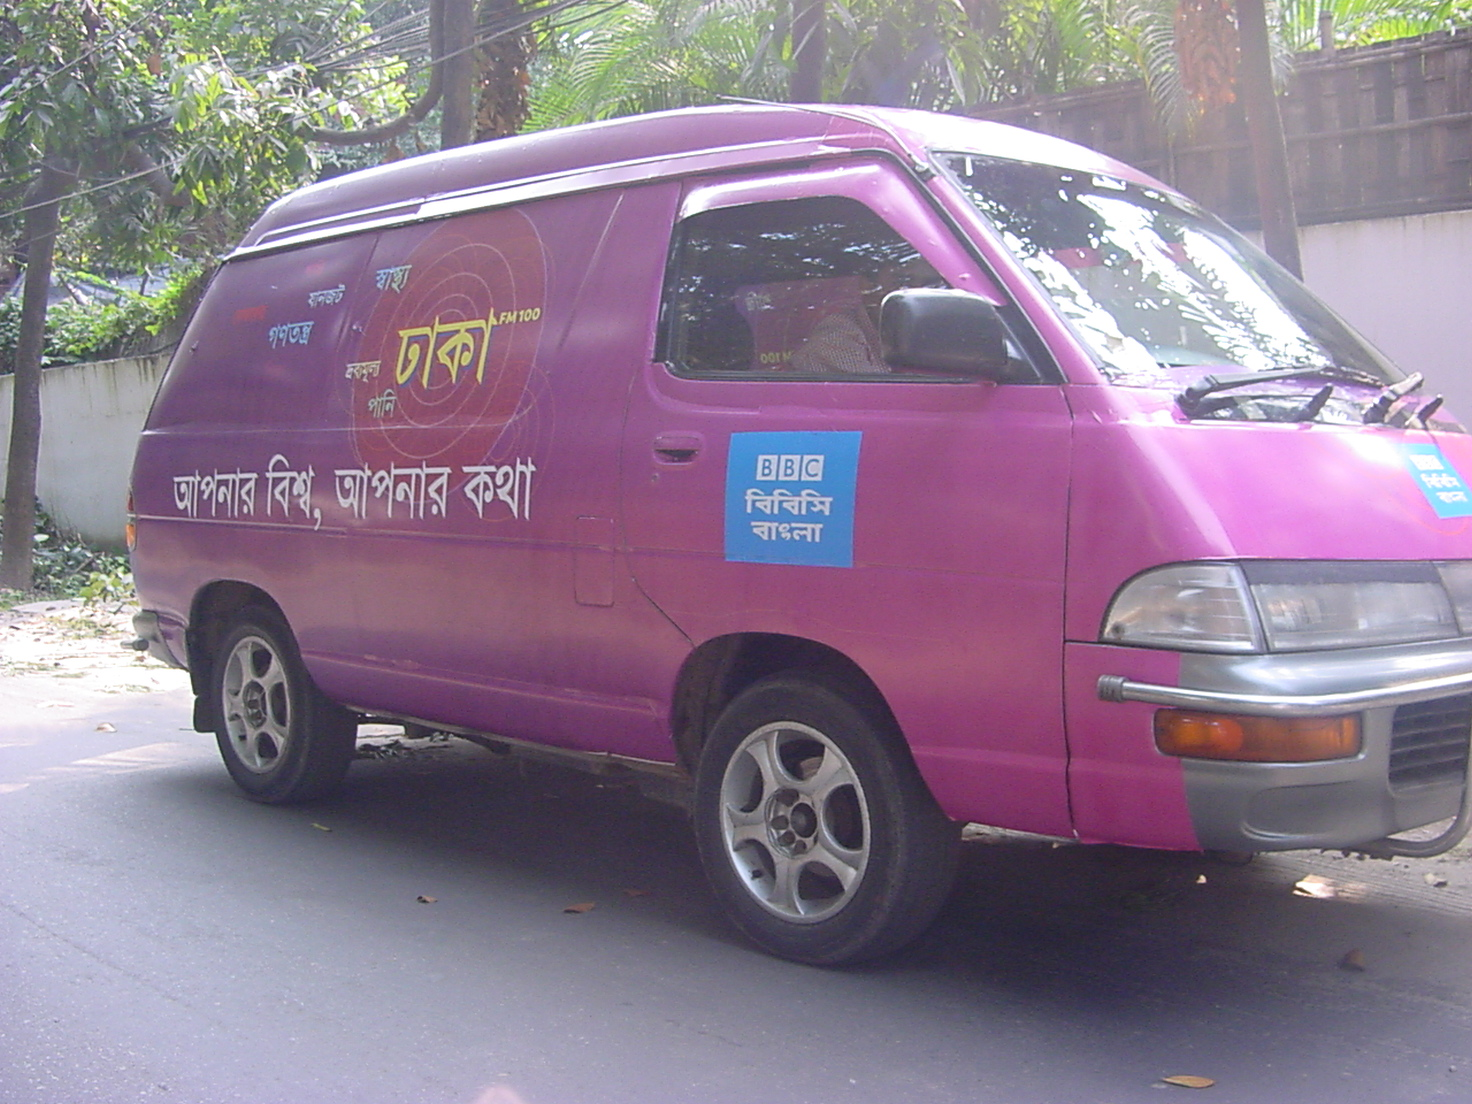 Bengali on a news van